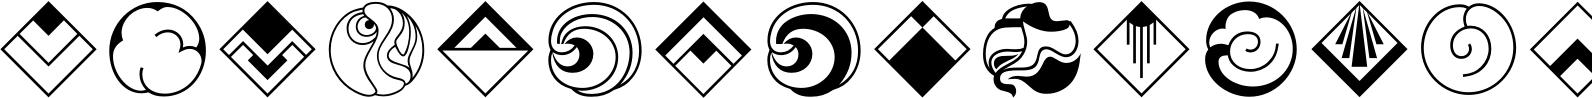 Rotata Mysticons